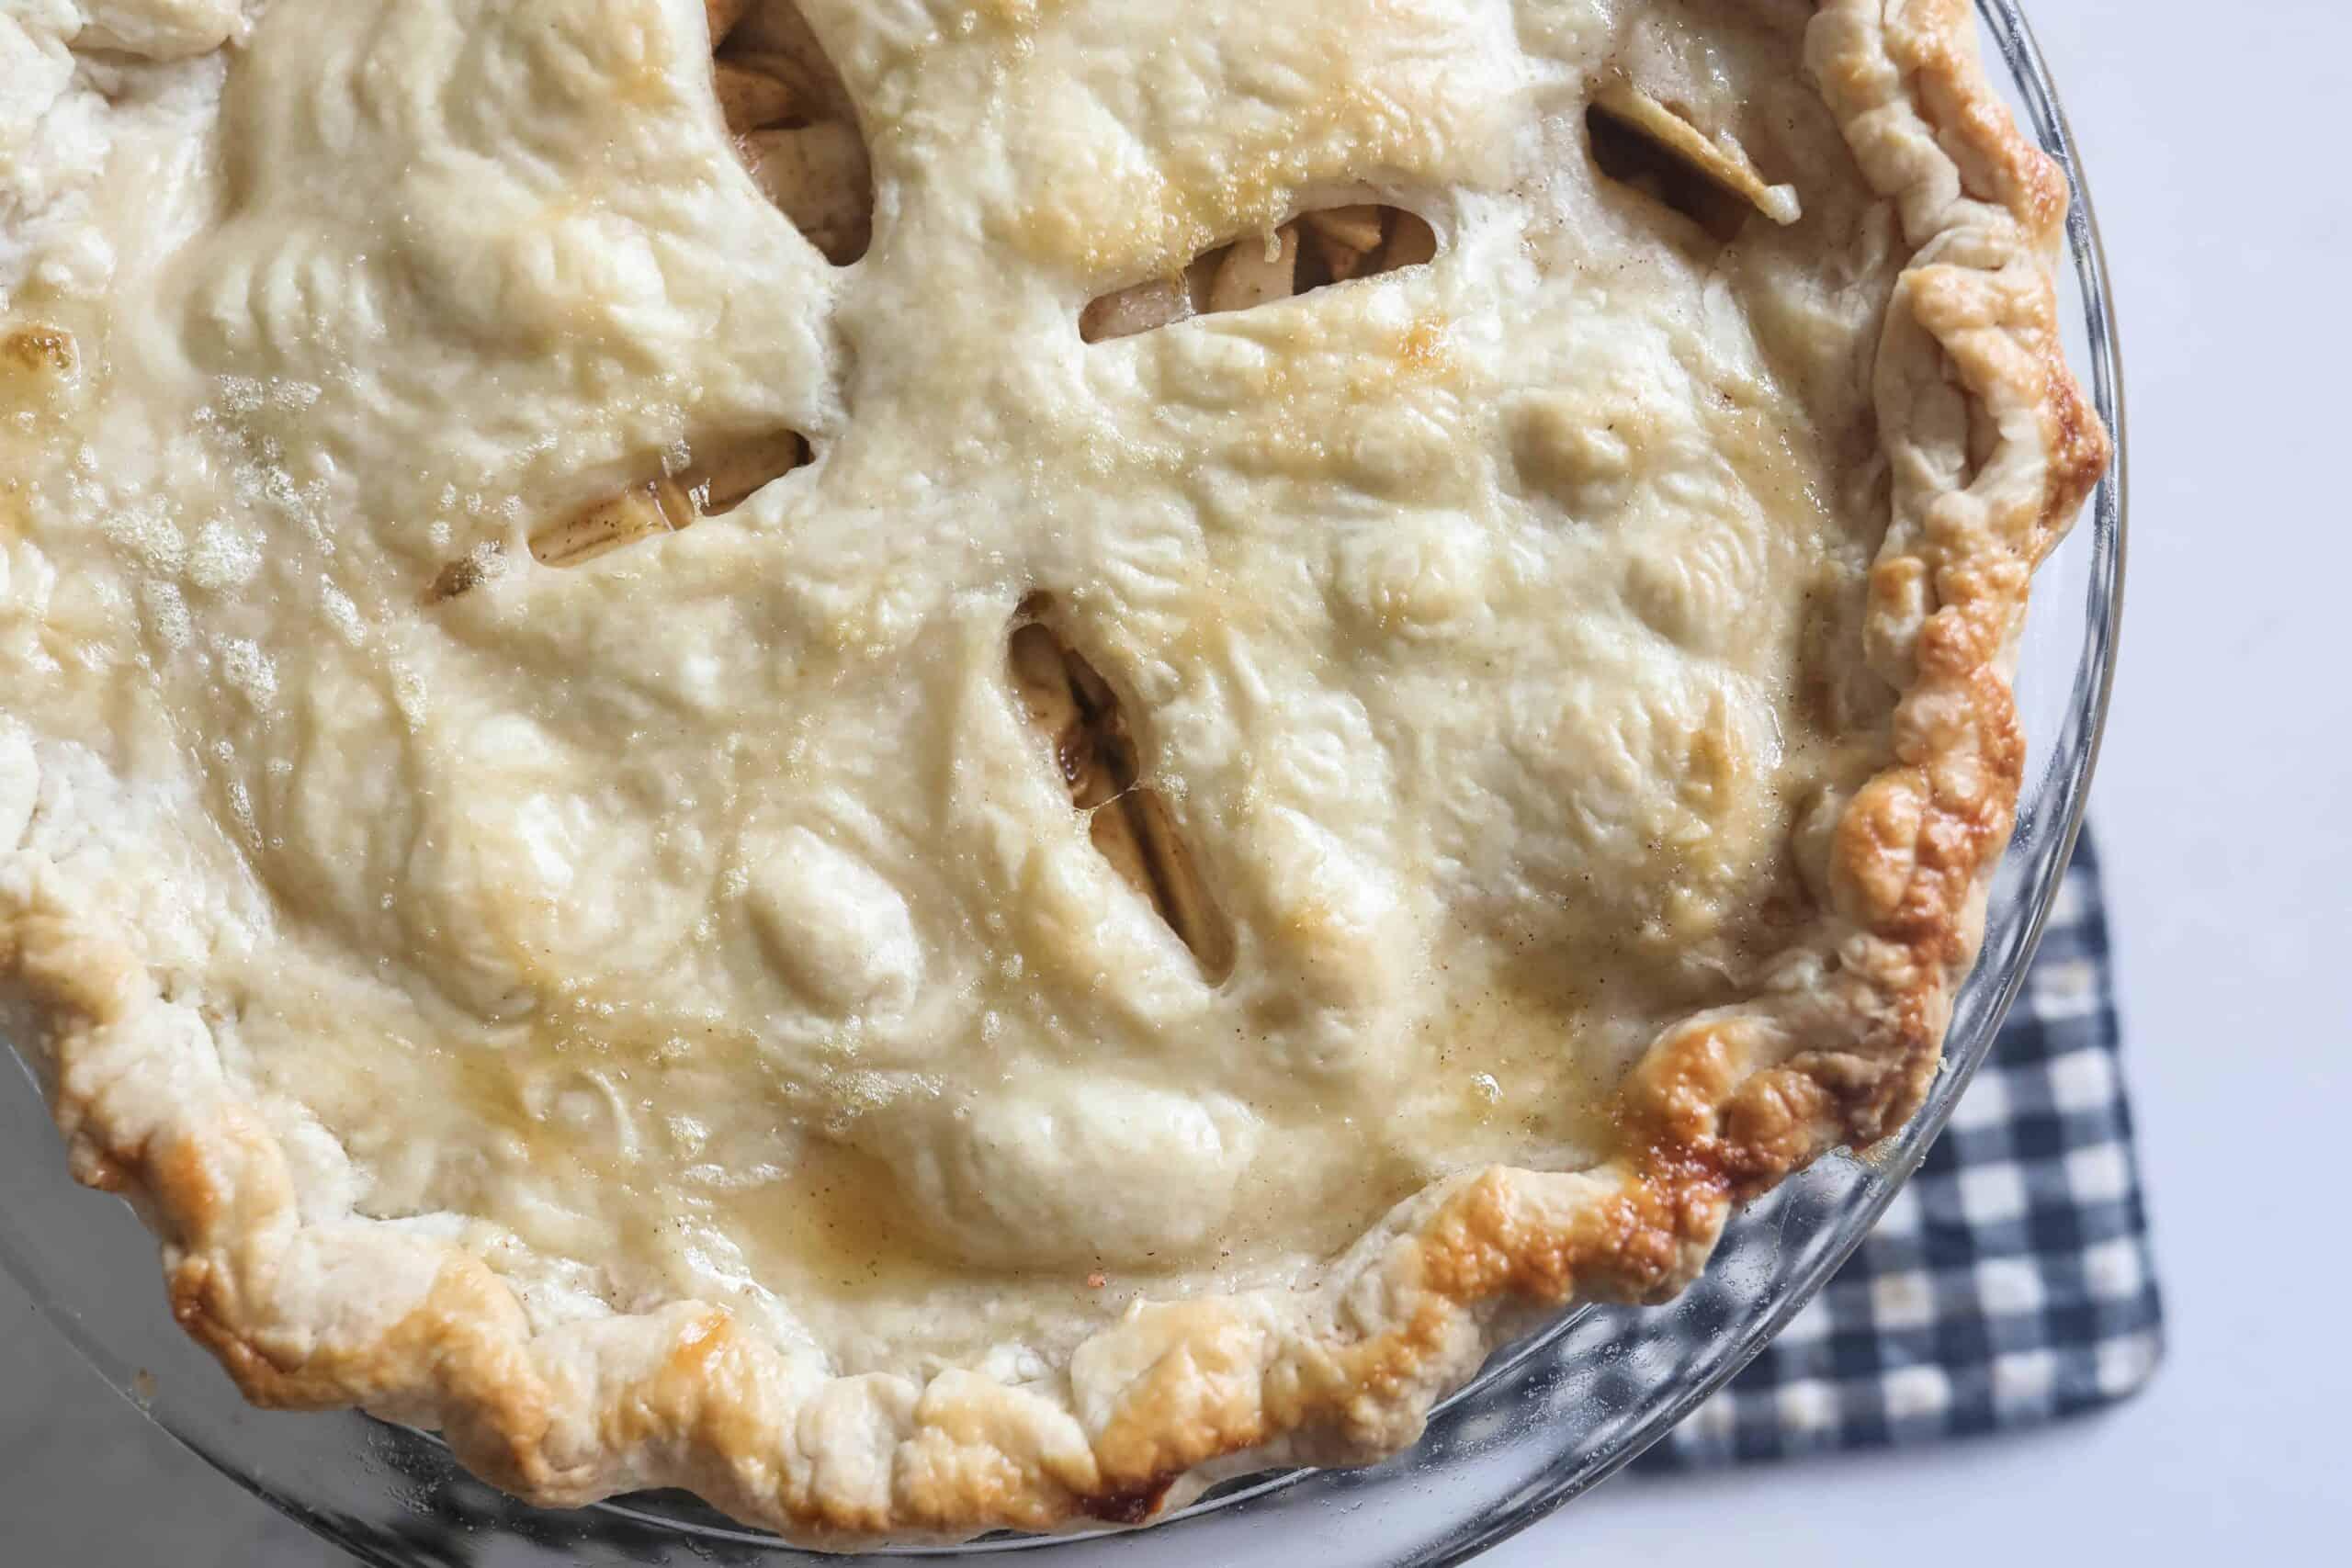 sourdough pie crust with golden brown edges